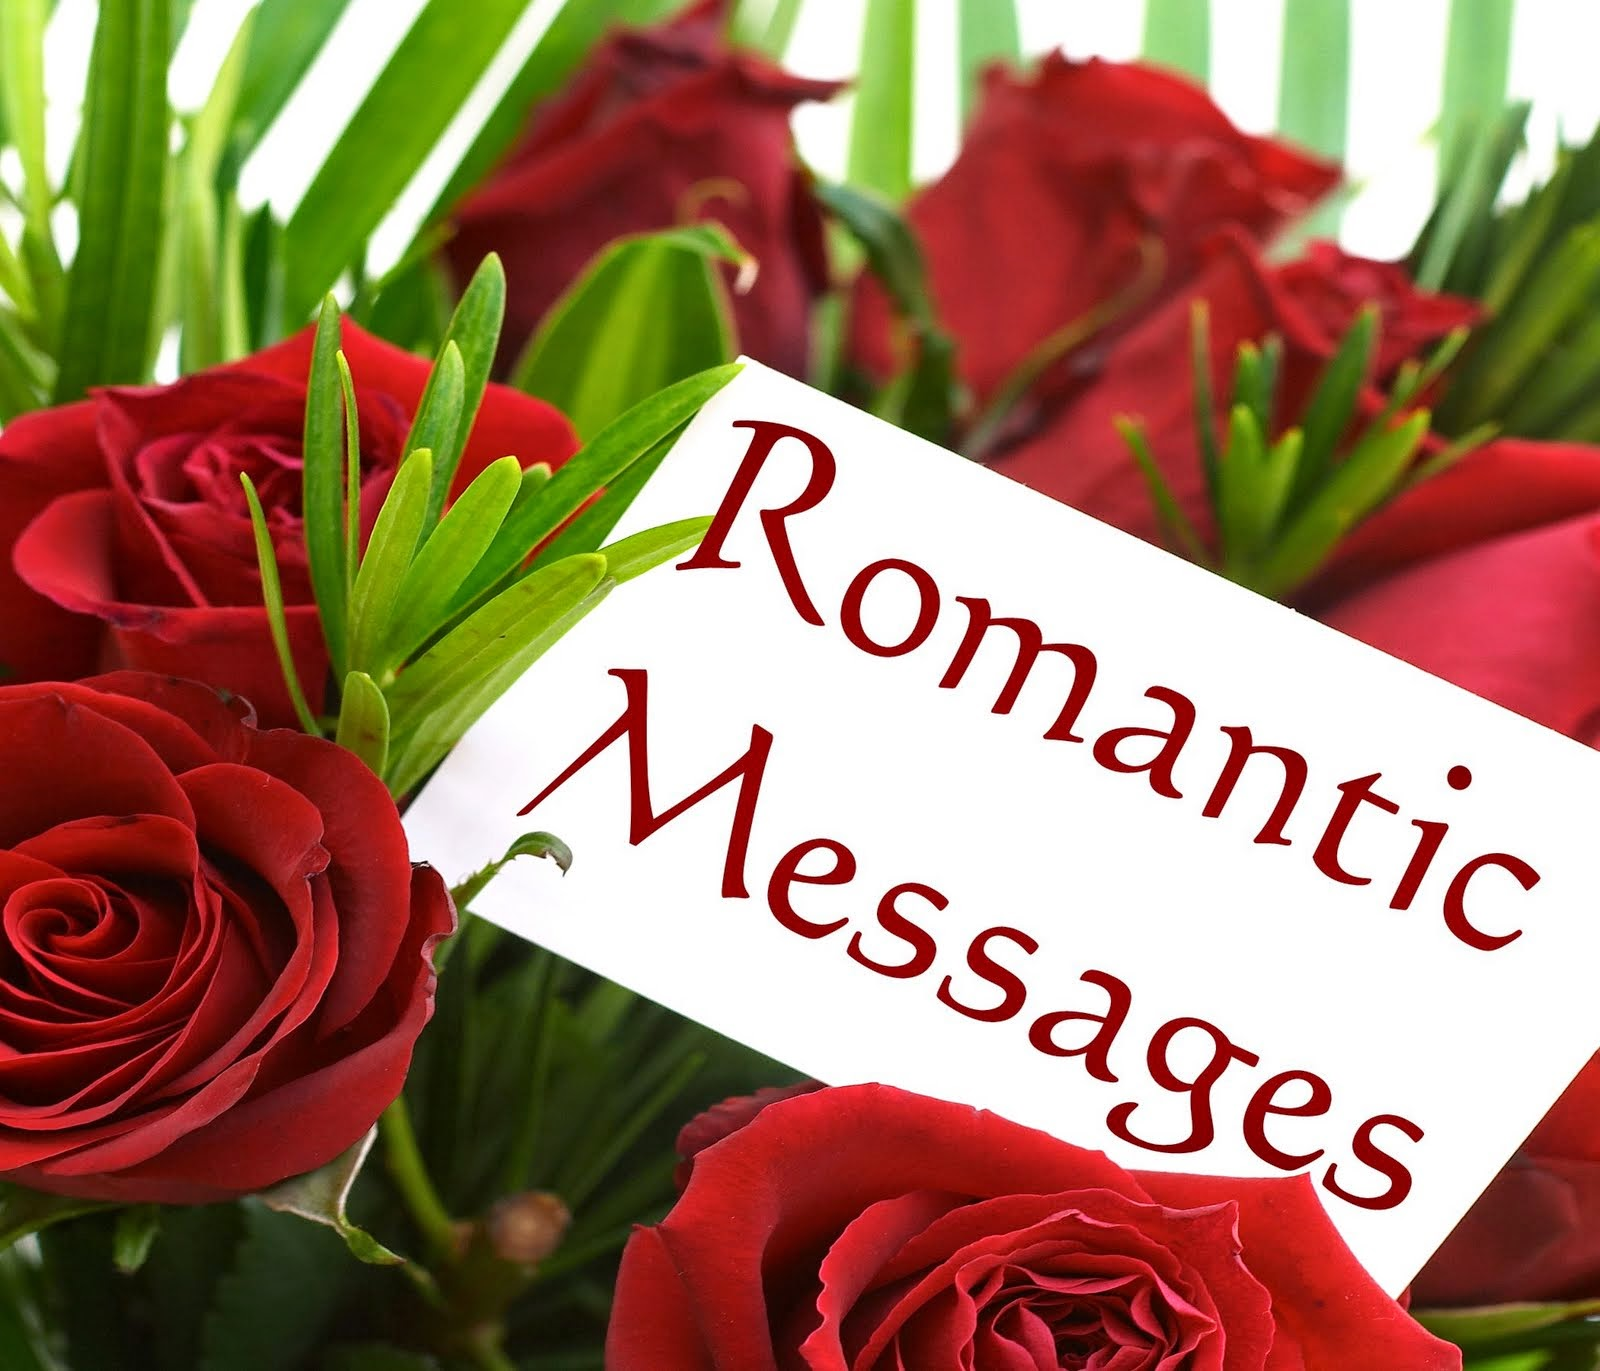 Kumpulan SMS Romantis